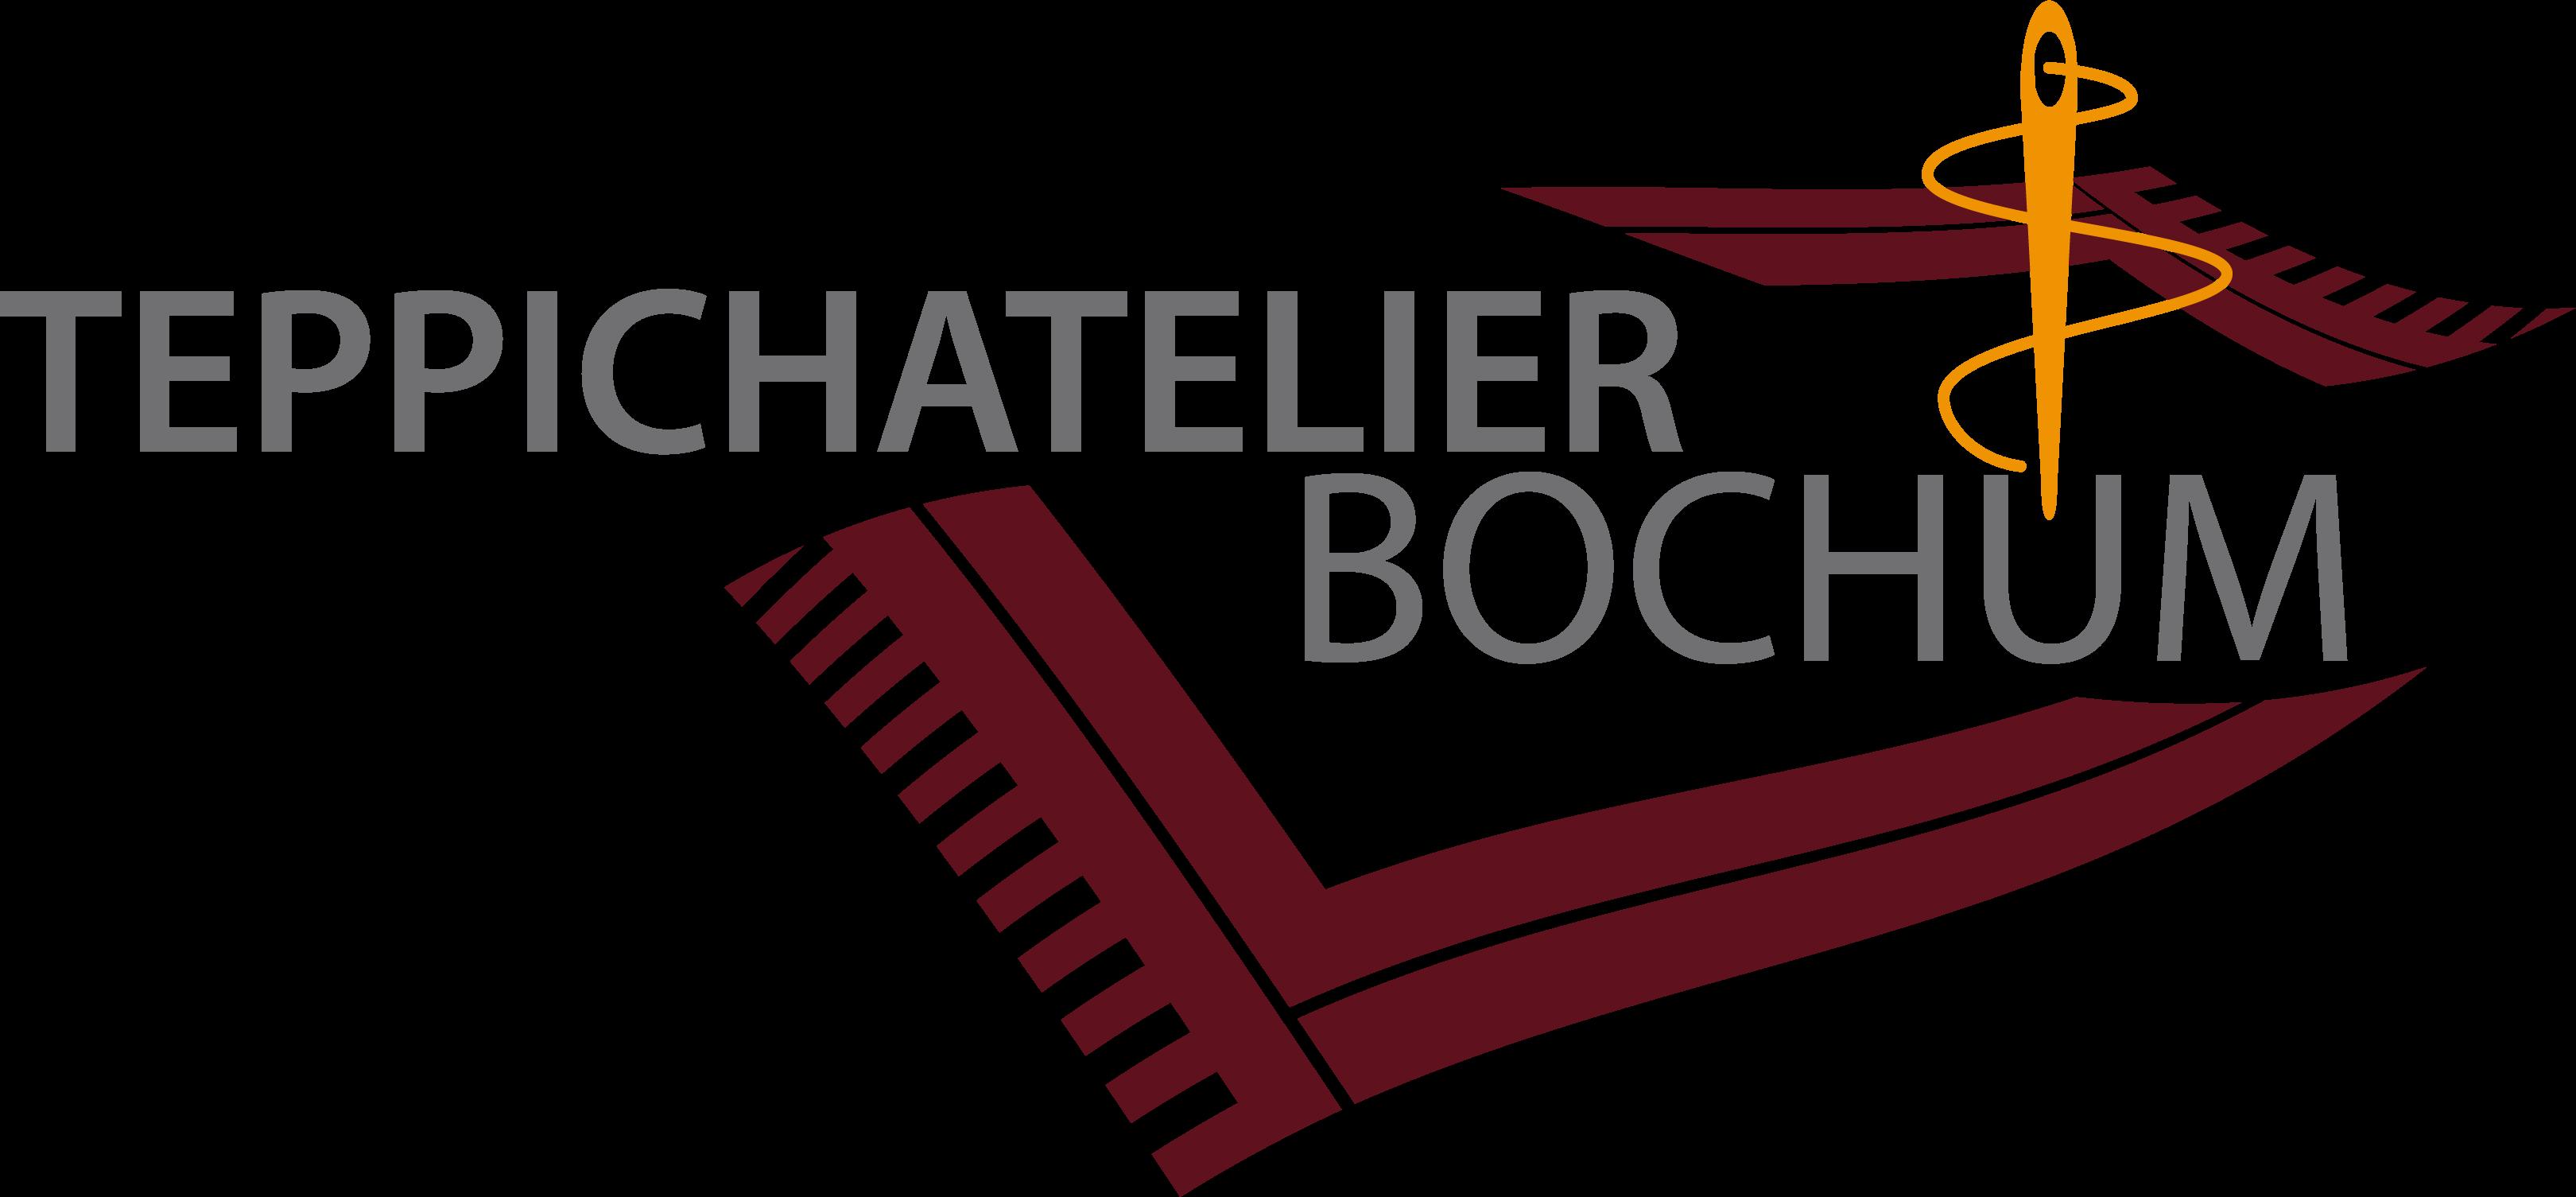 Teppichatelier Bochum